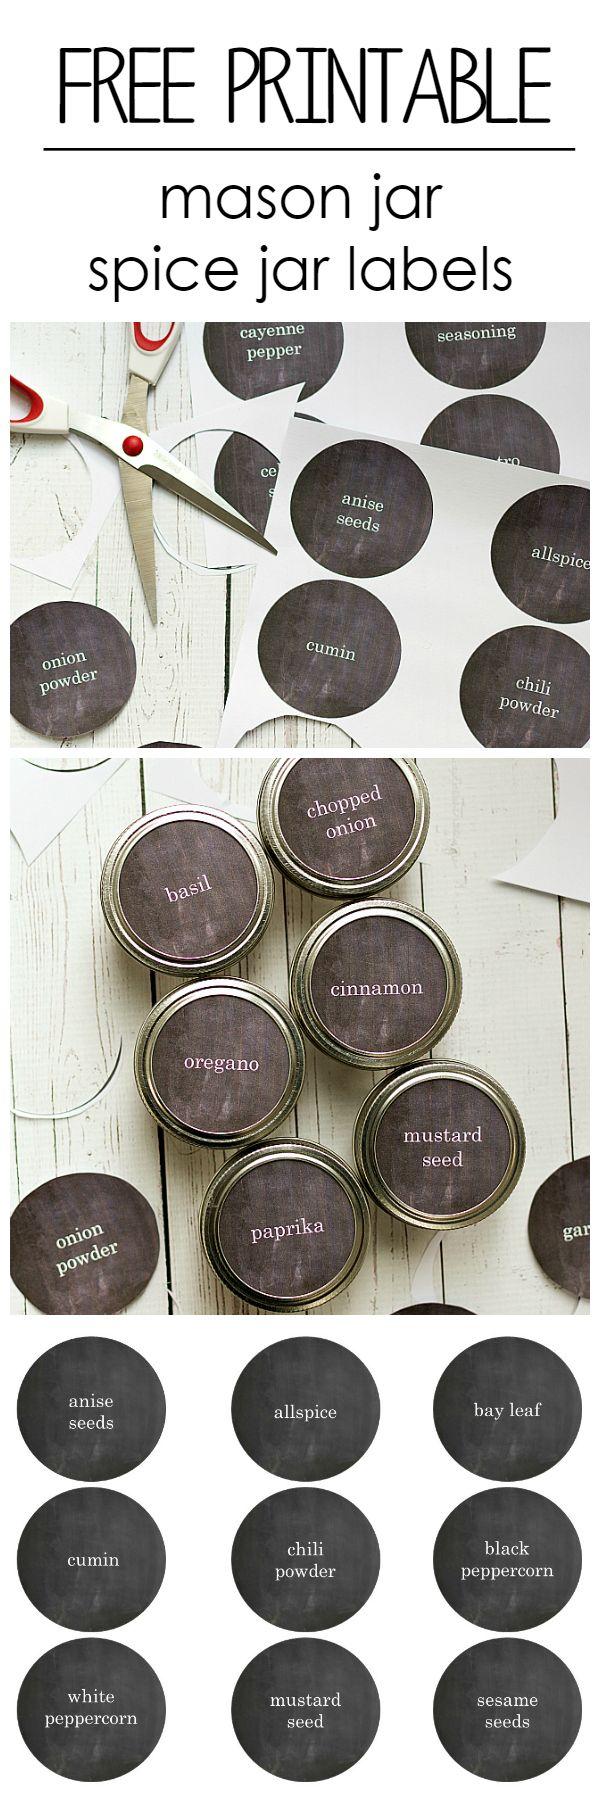 Mason Jar Craft Ideas: Spice Drawer Organization and Free Printable Labels